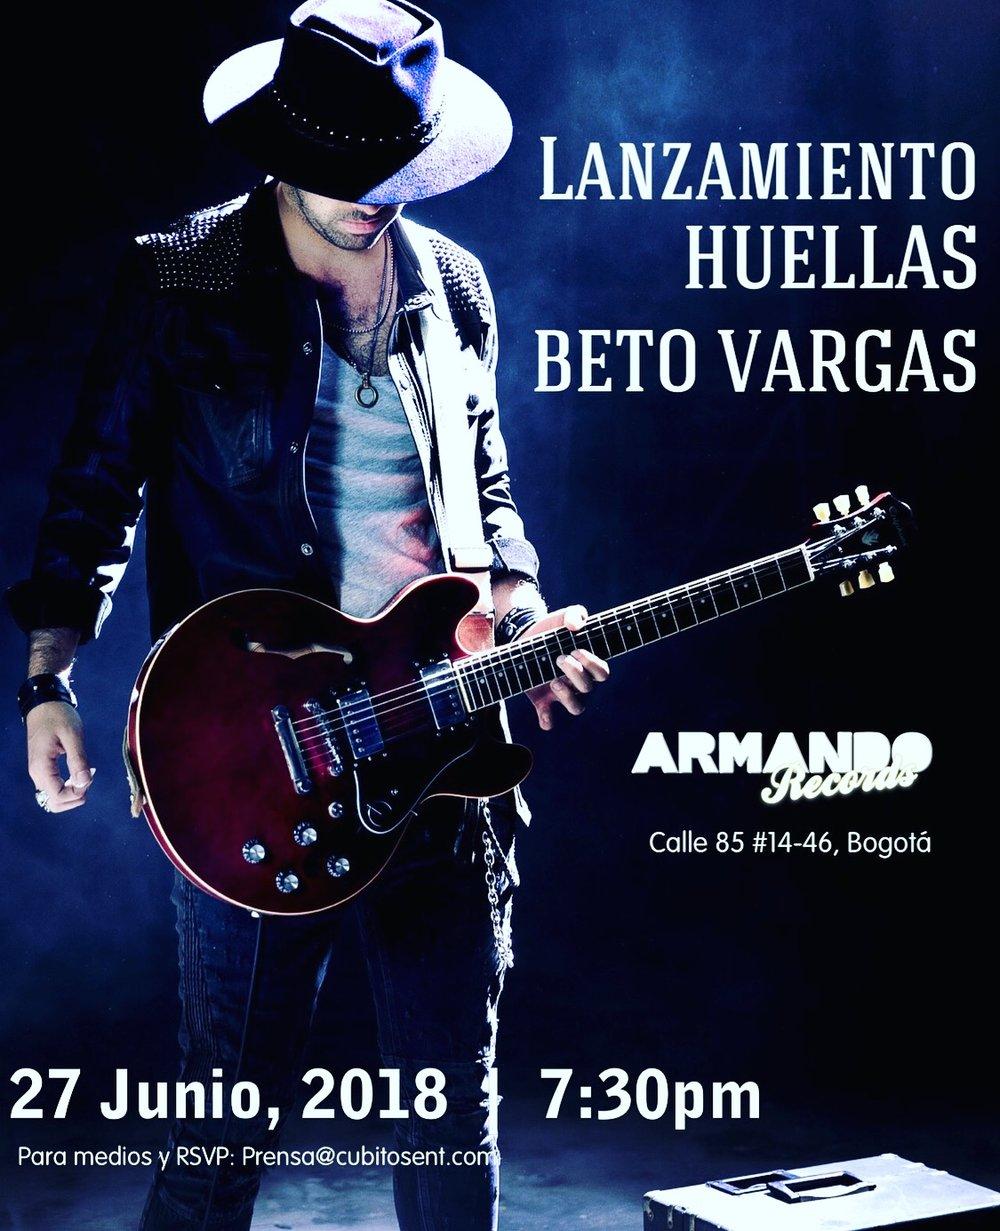 Flyer Armando_Final.JPG